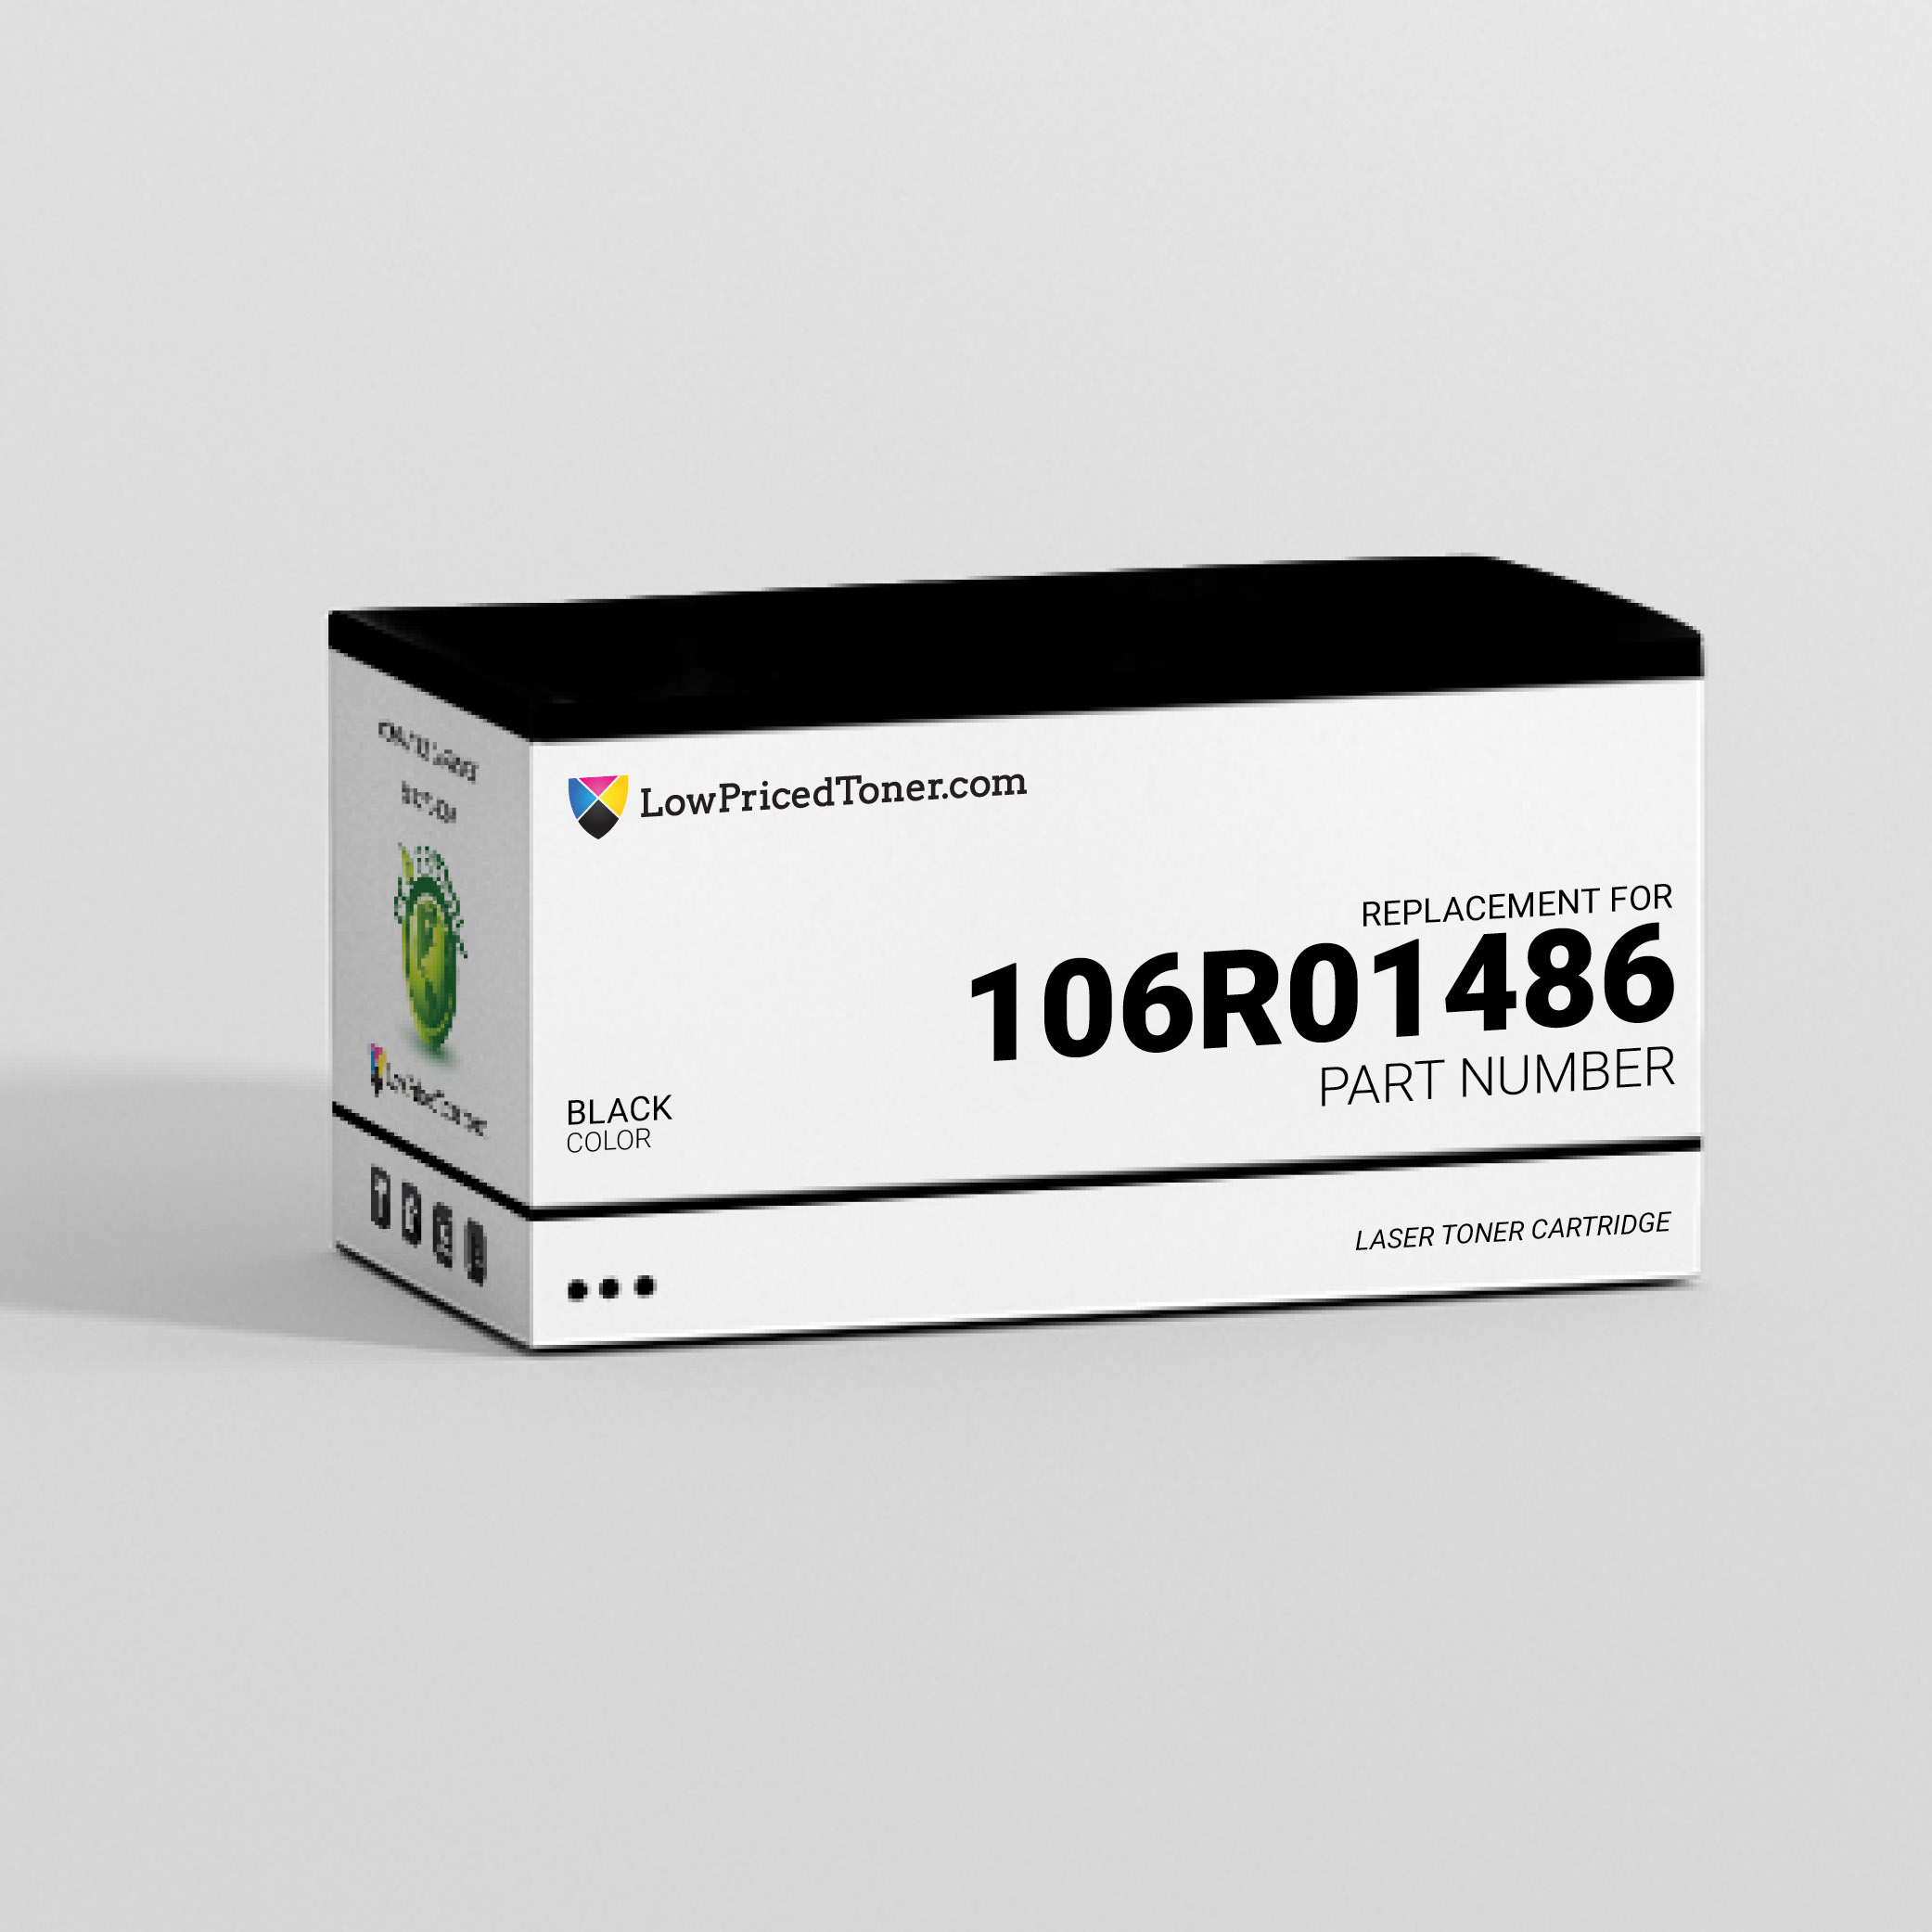 Xerox 106R01486 Compatible Black Laser Toner Cartridge